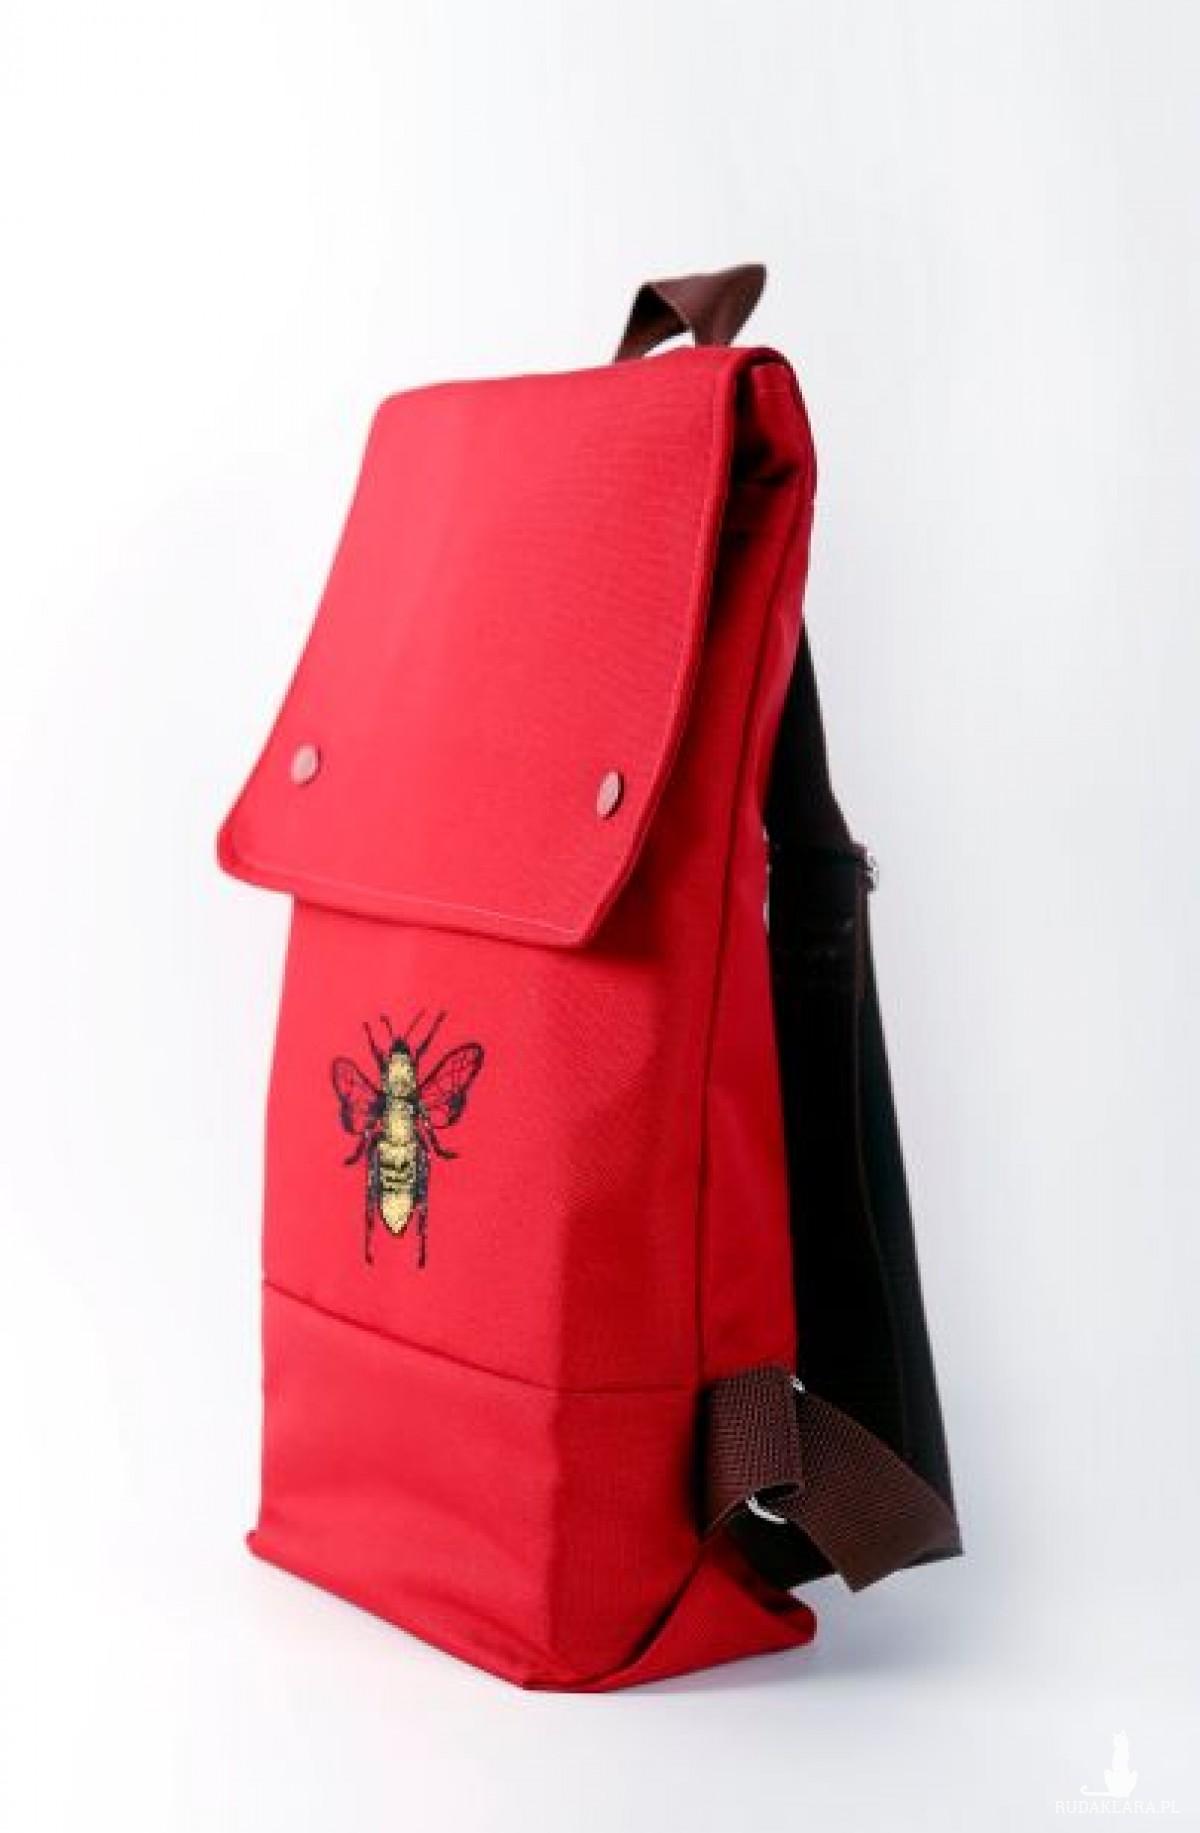 Plecak Chudy